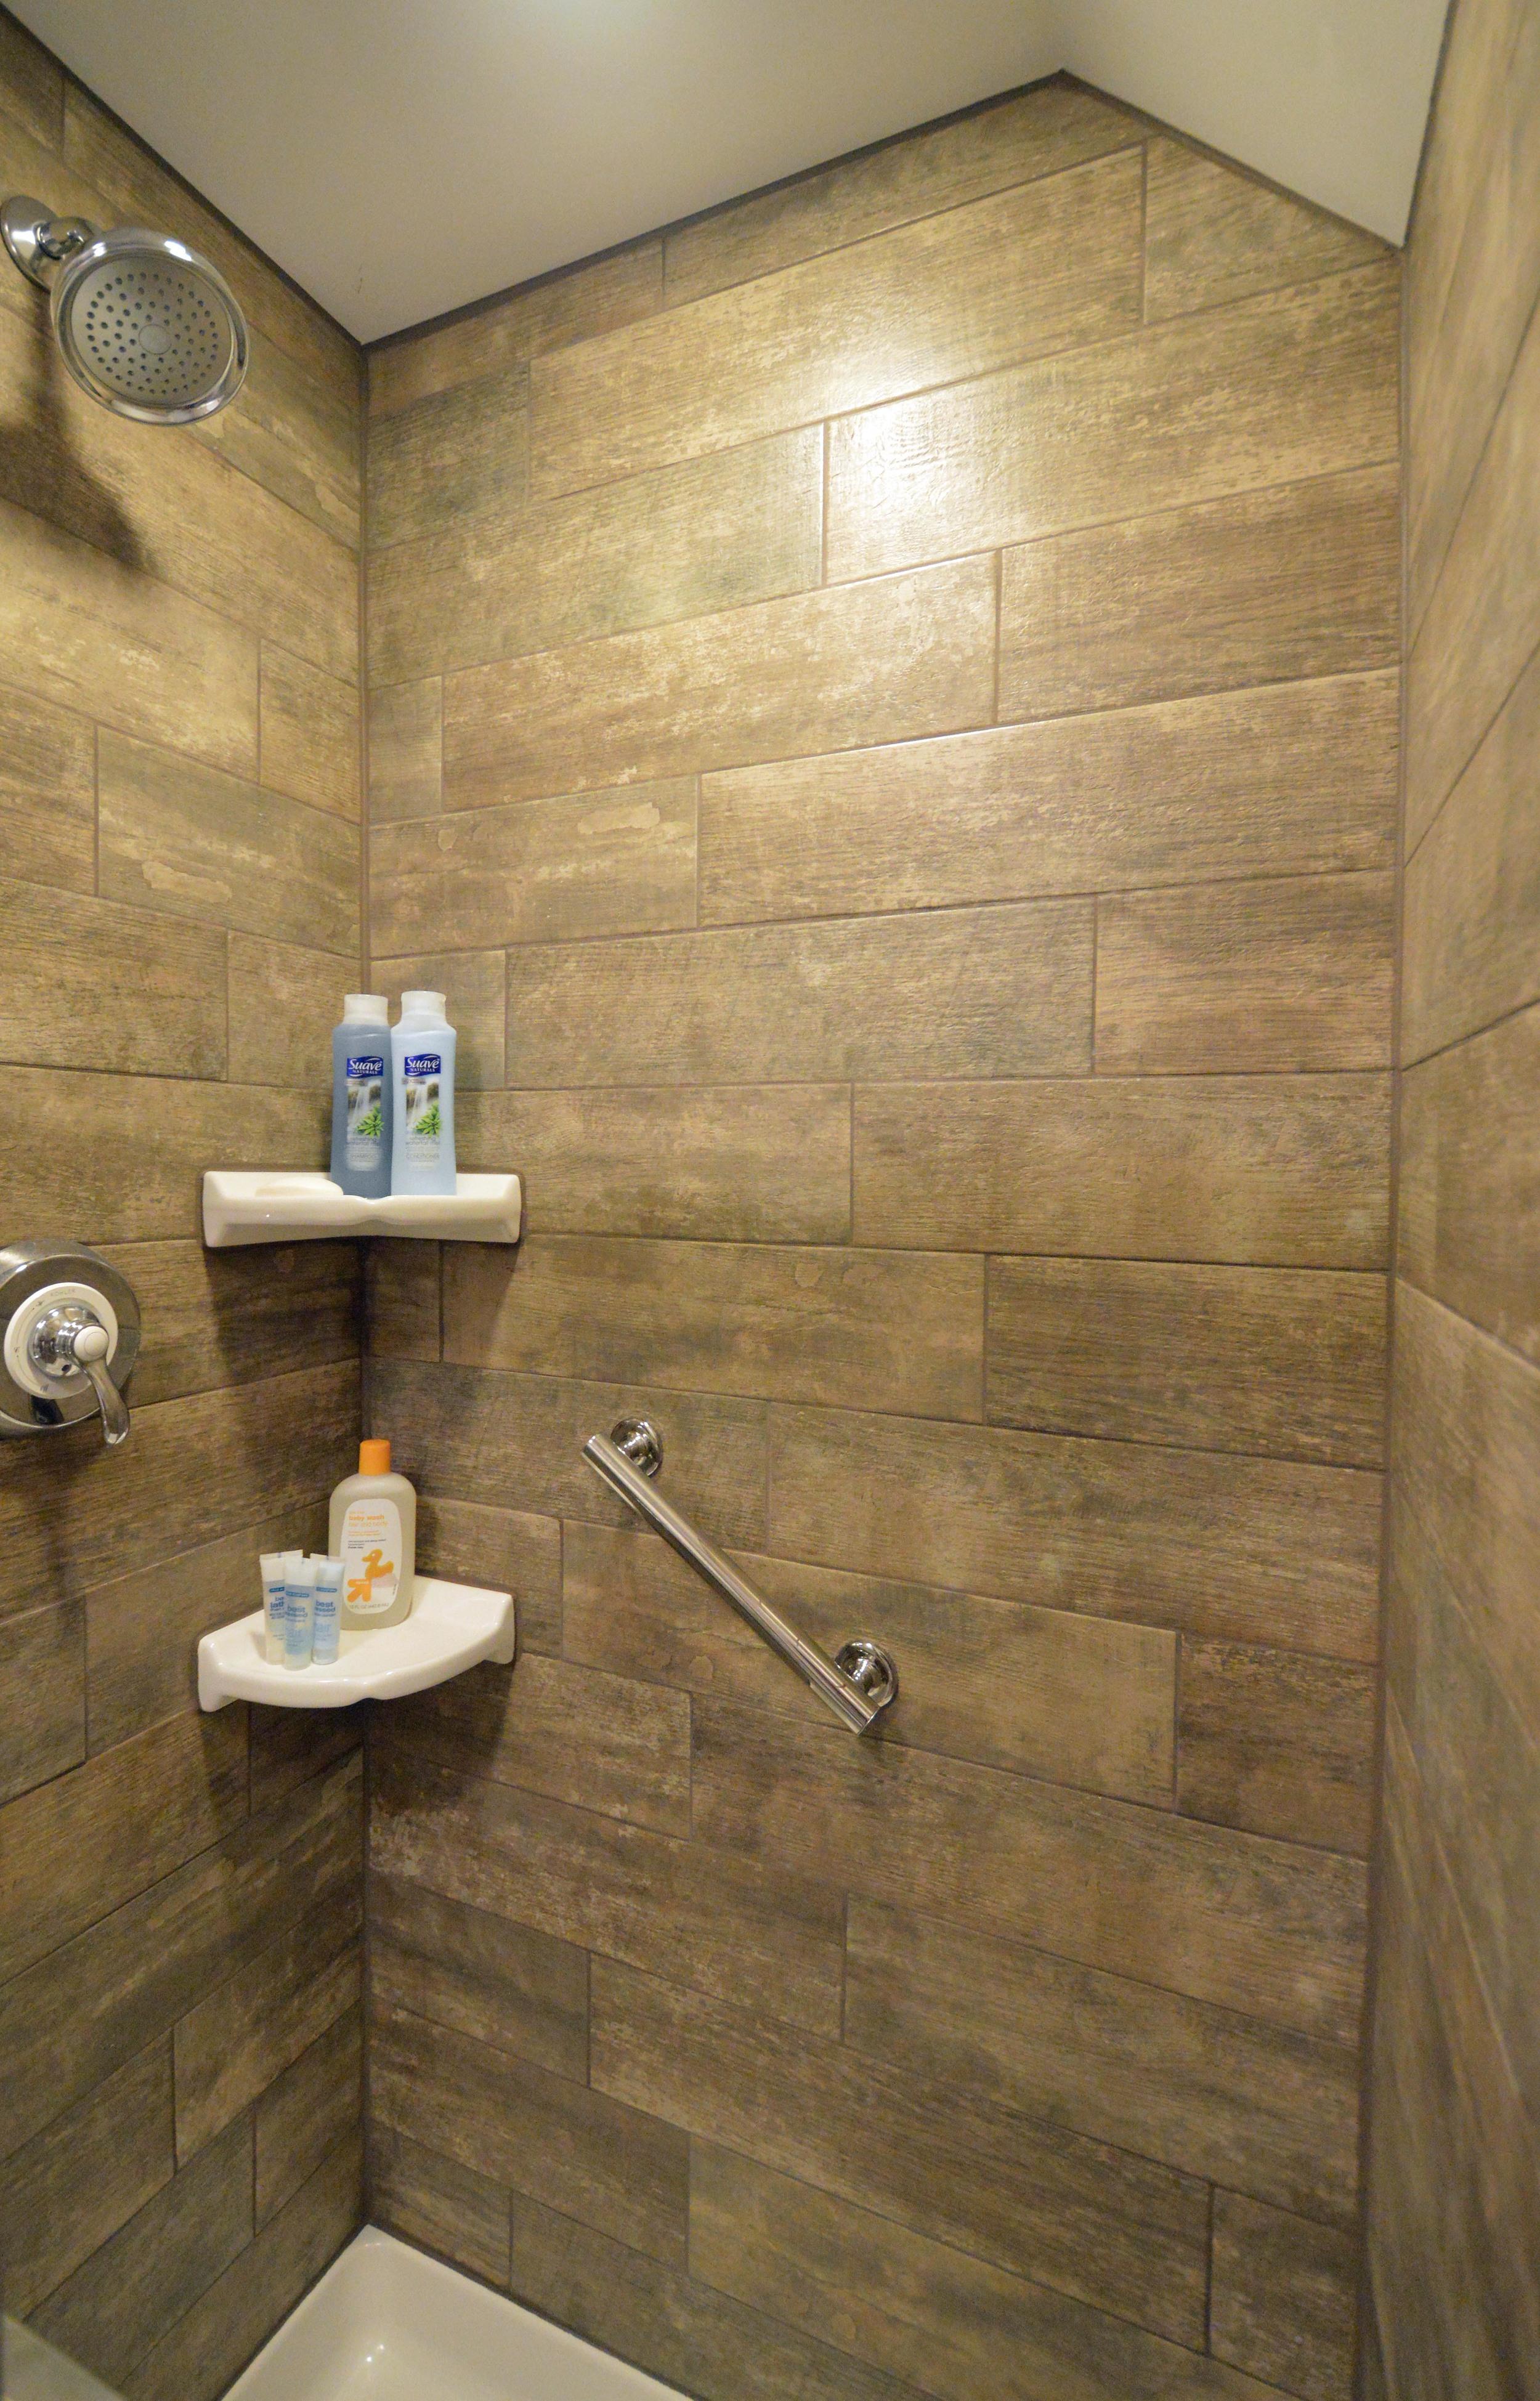 New shower in Bolton Landing, NY